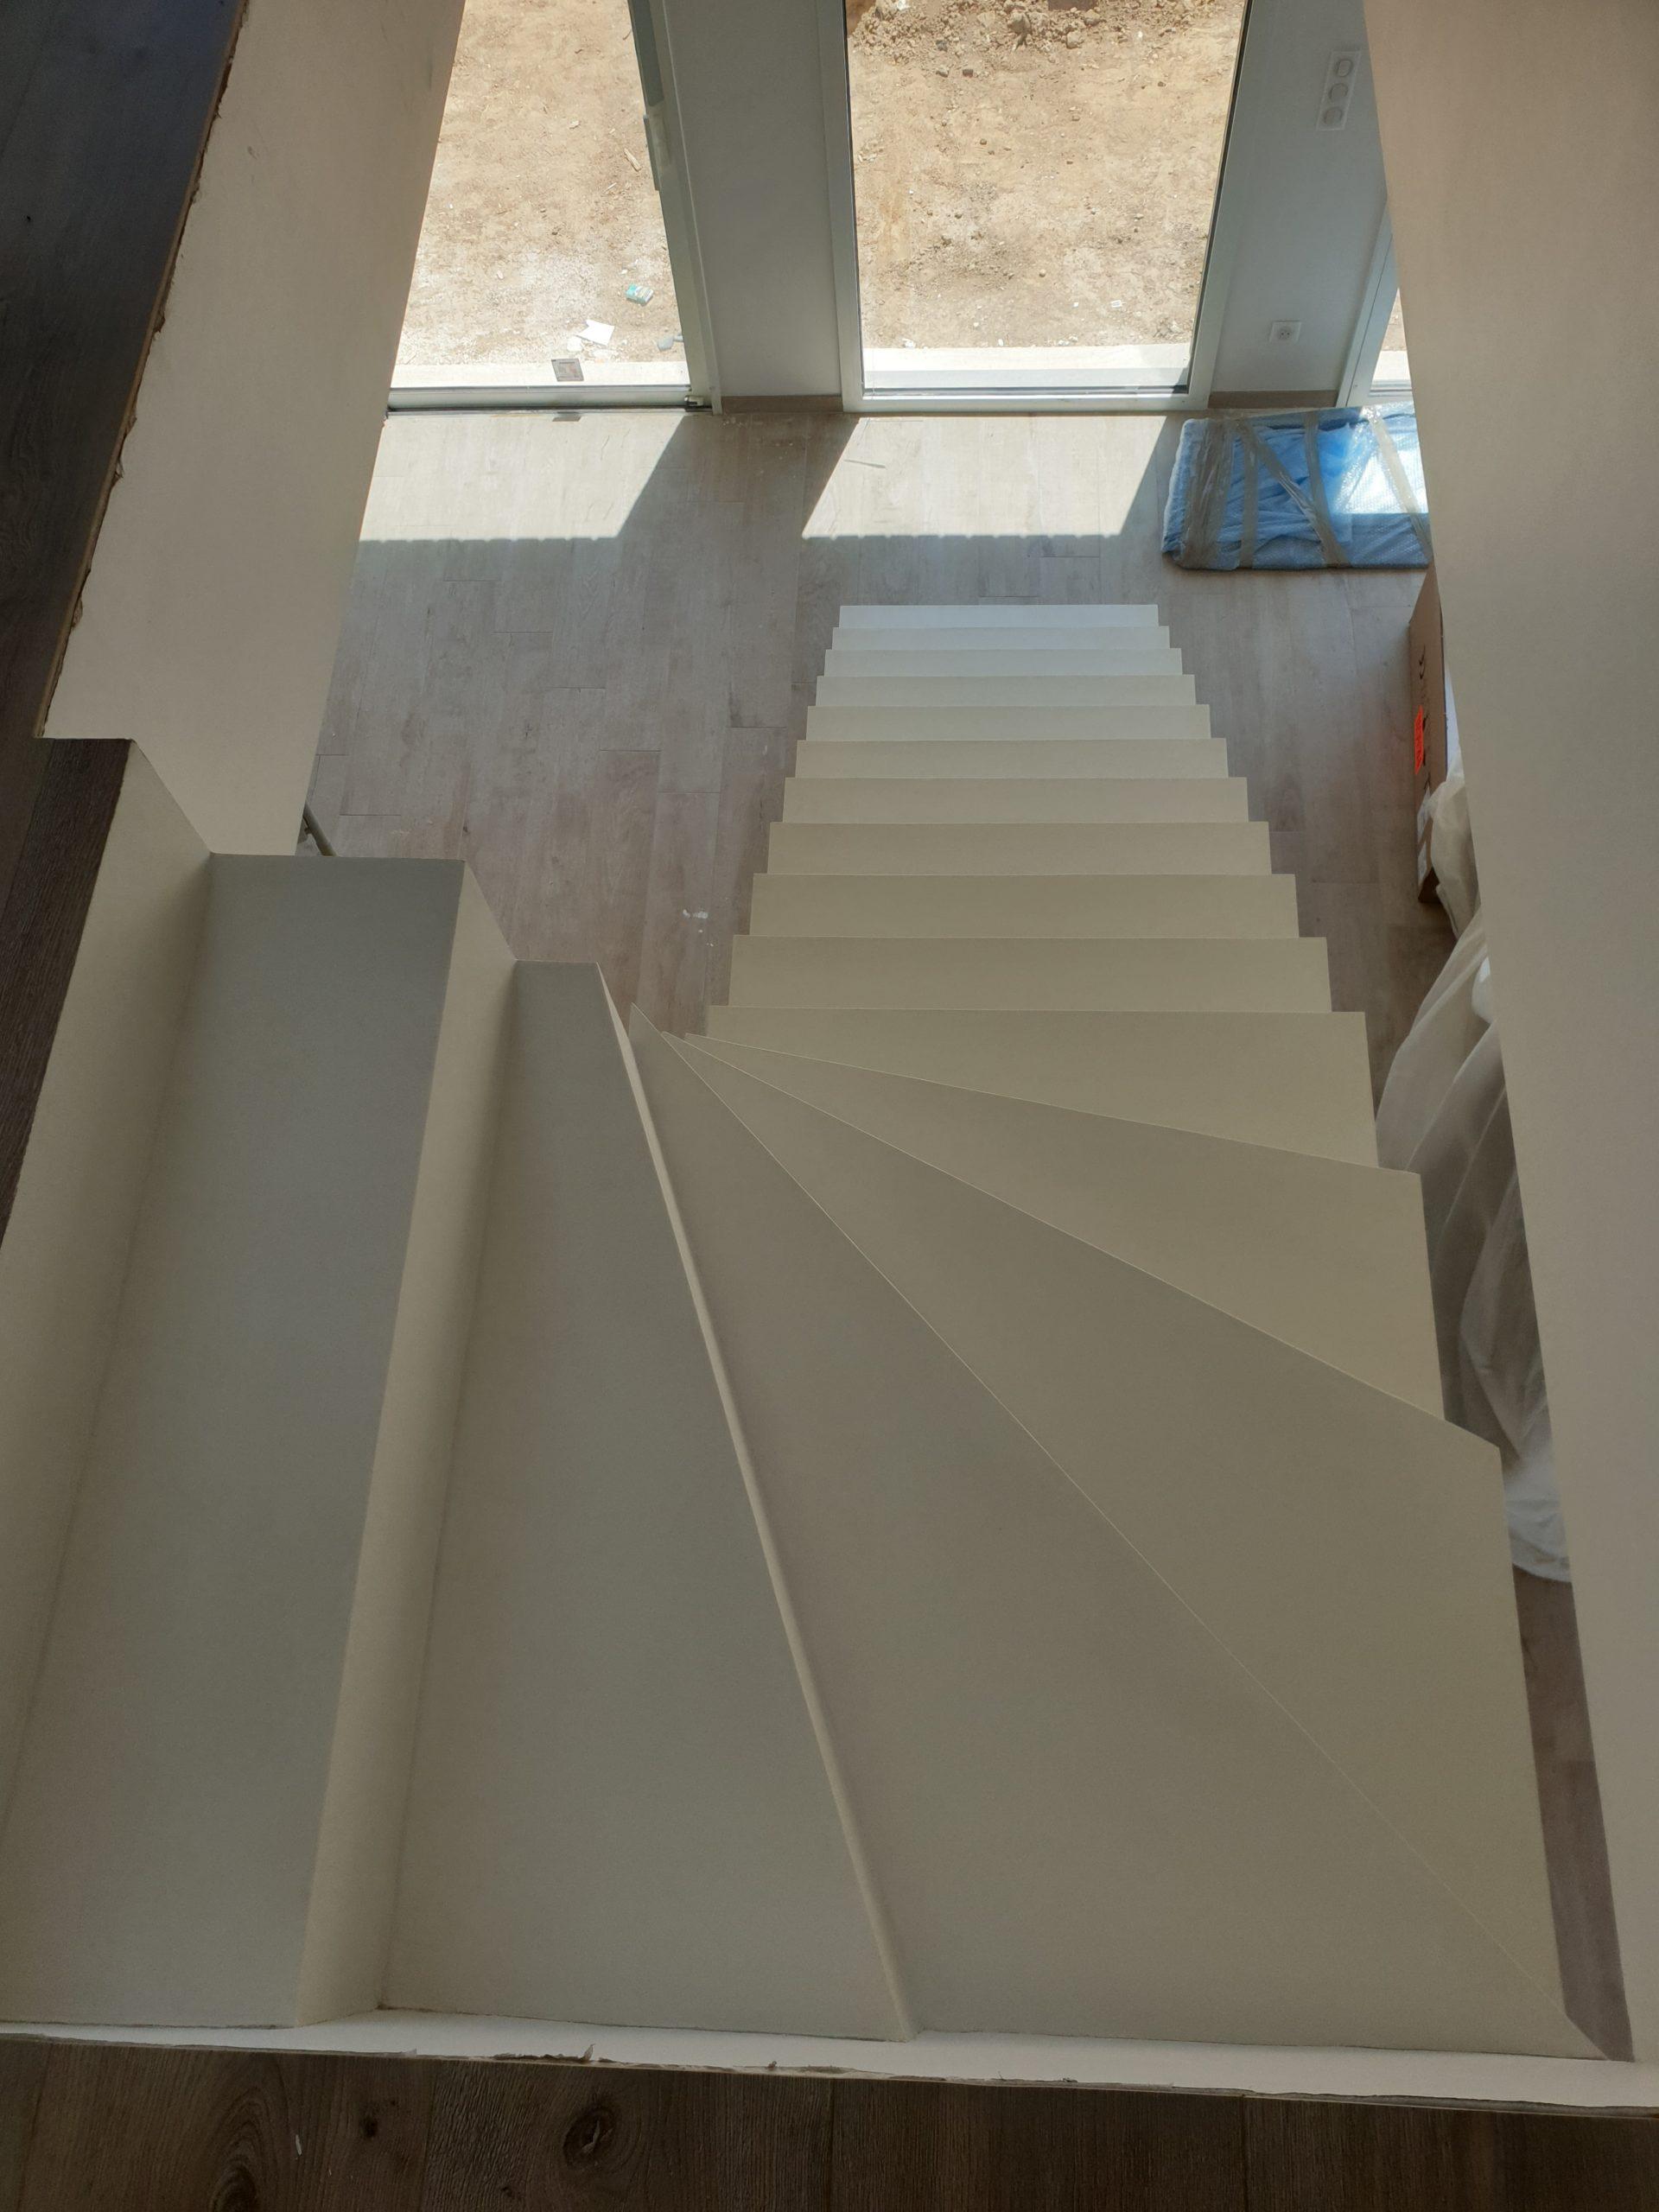 Escalier béton décoré en béton ciré blanc